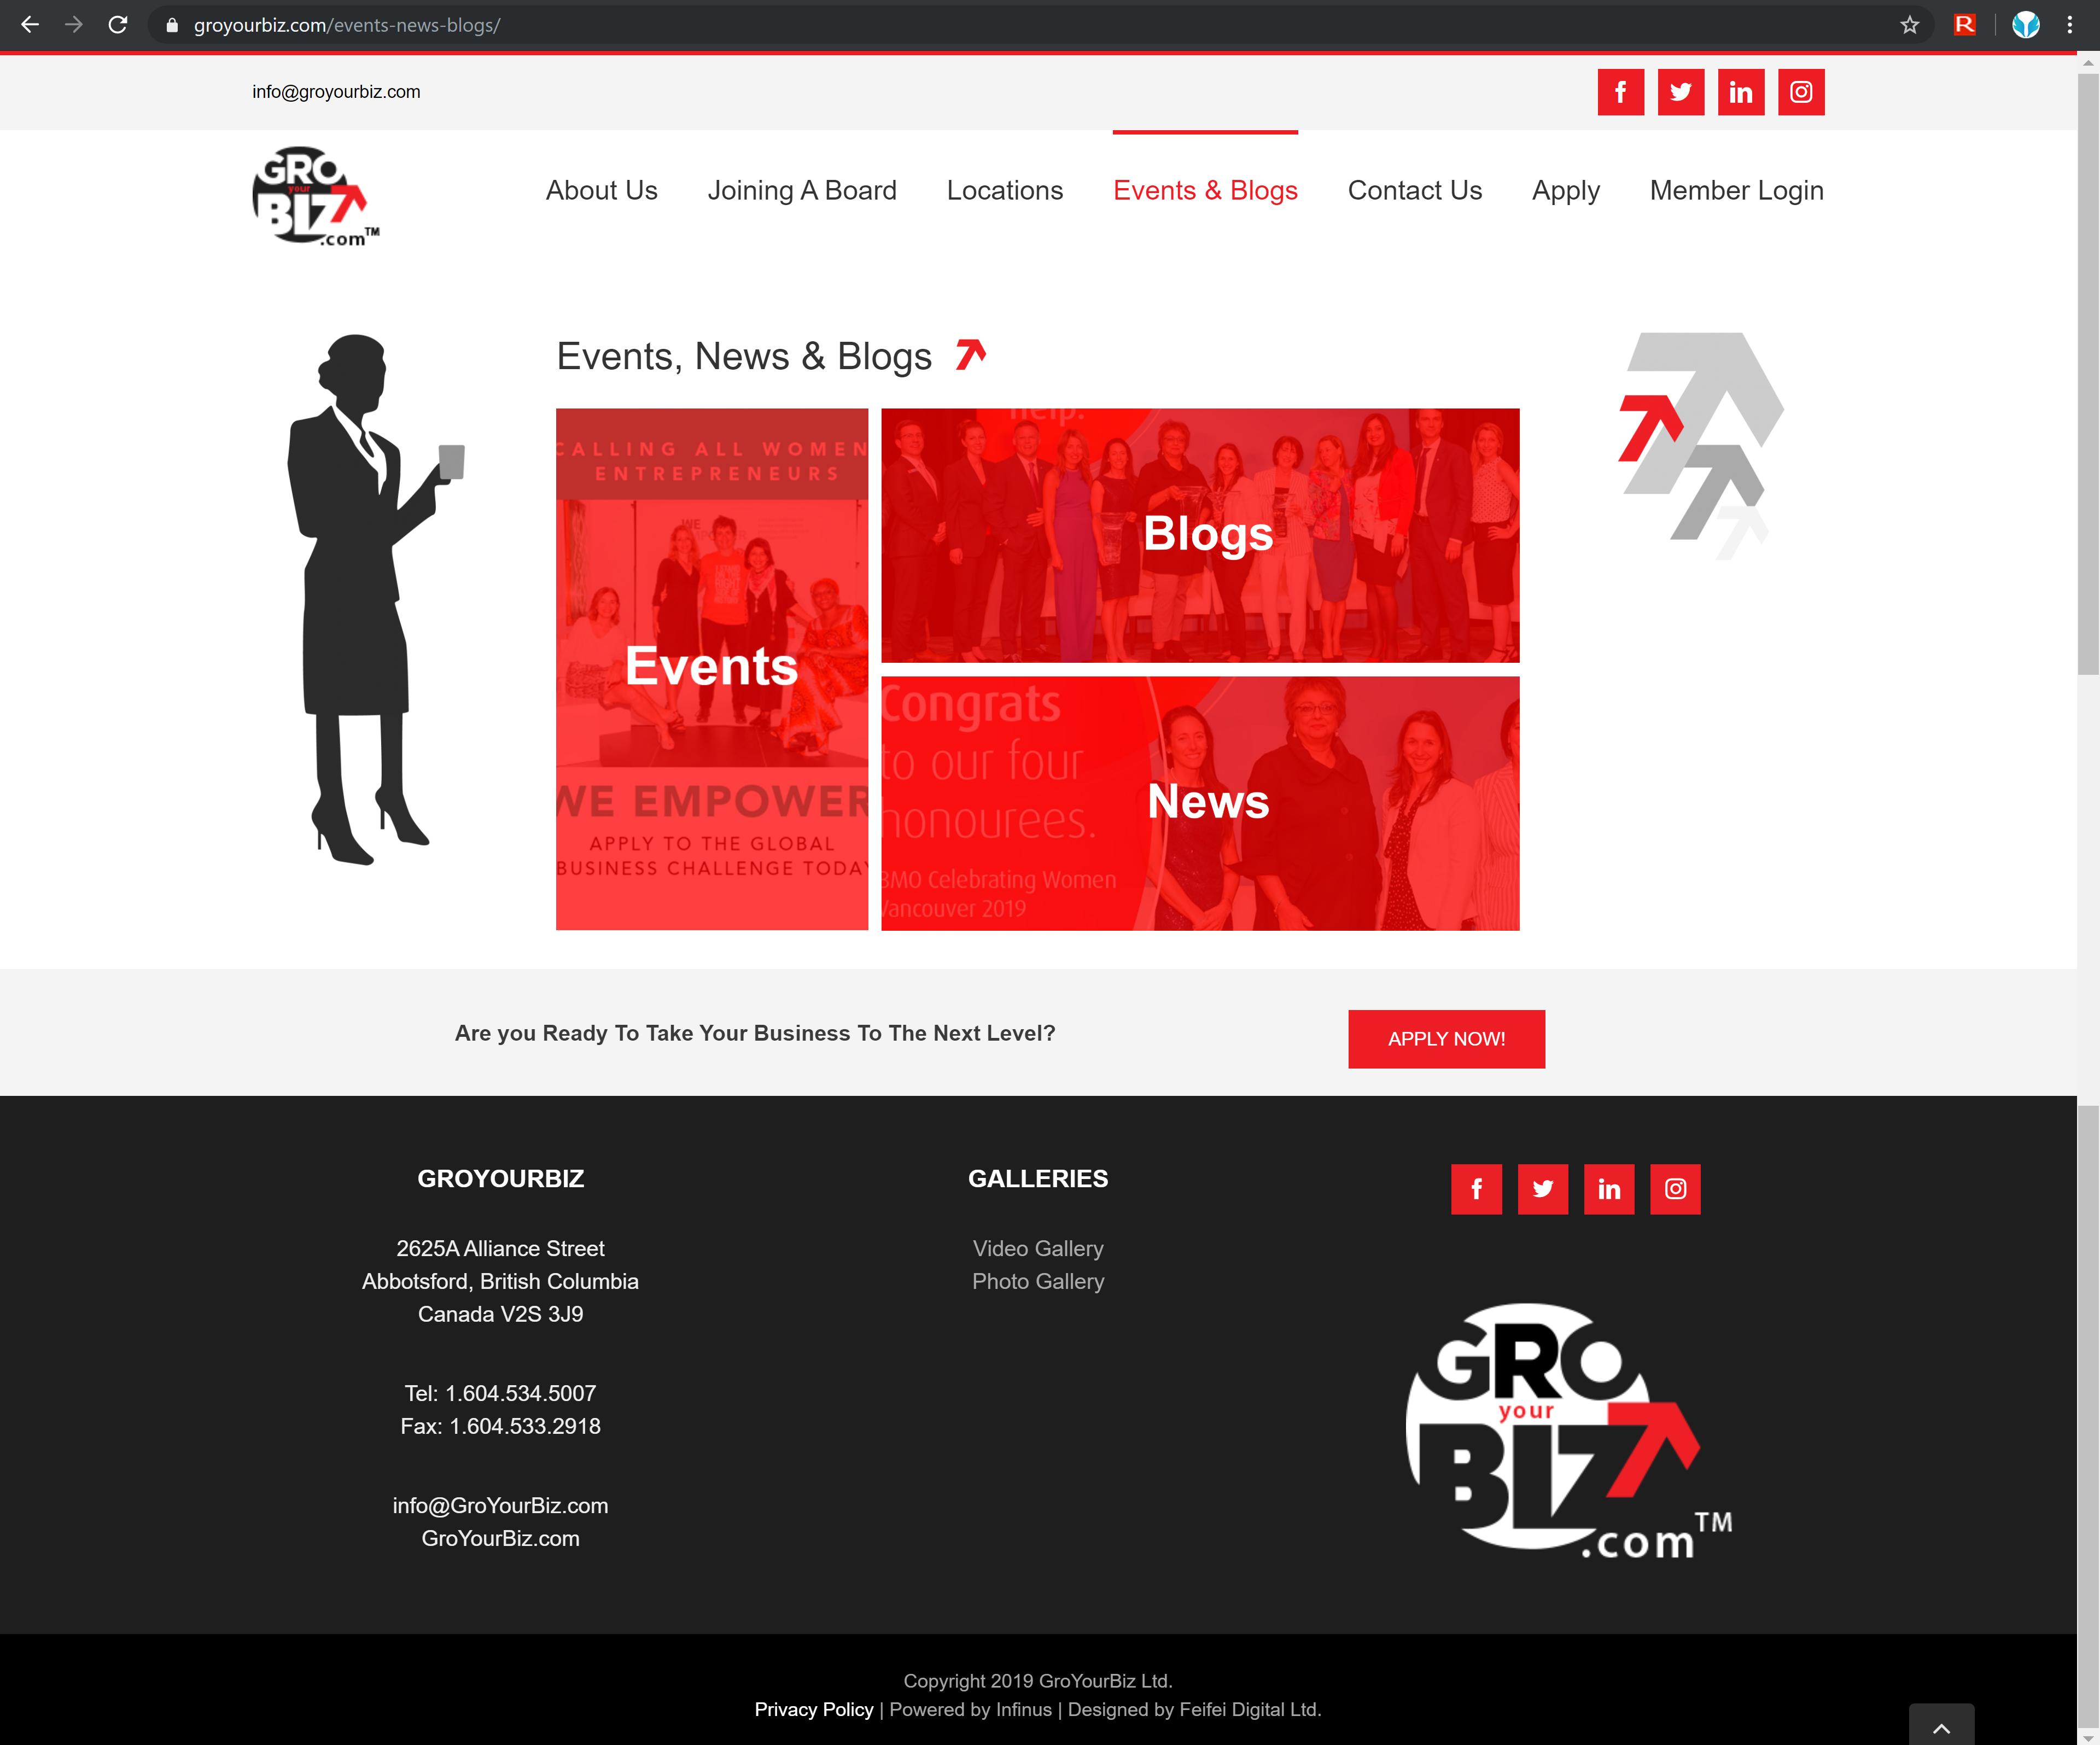 GroYourBiz Events, Blogs, and News Page | User Interface and Front End Development | Feifei Digital | Monika Szucs